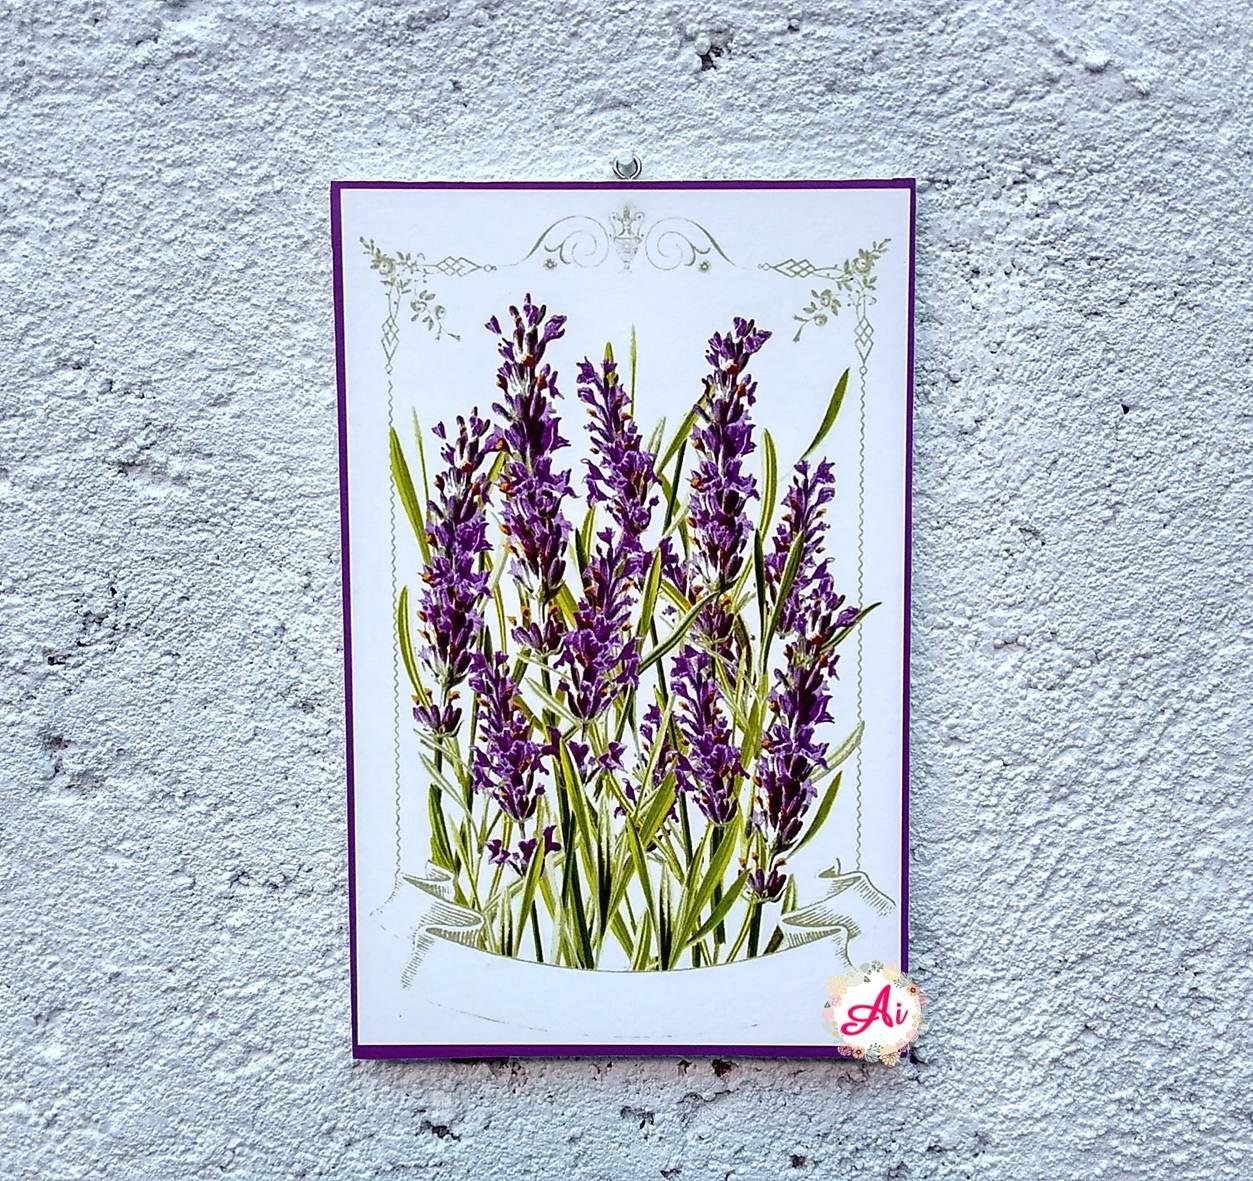 Produk UKM  - Dekorasi Rumah L Wall Decor L Hiasan Dinding Shabby Chic   Flower 3 552a668a17